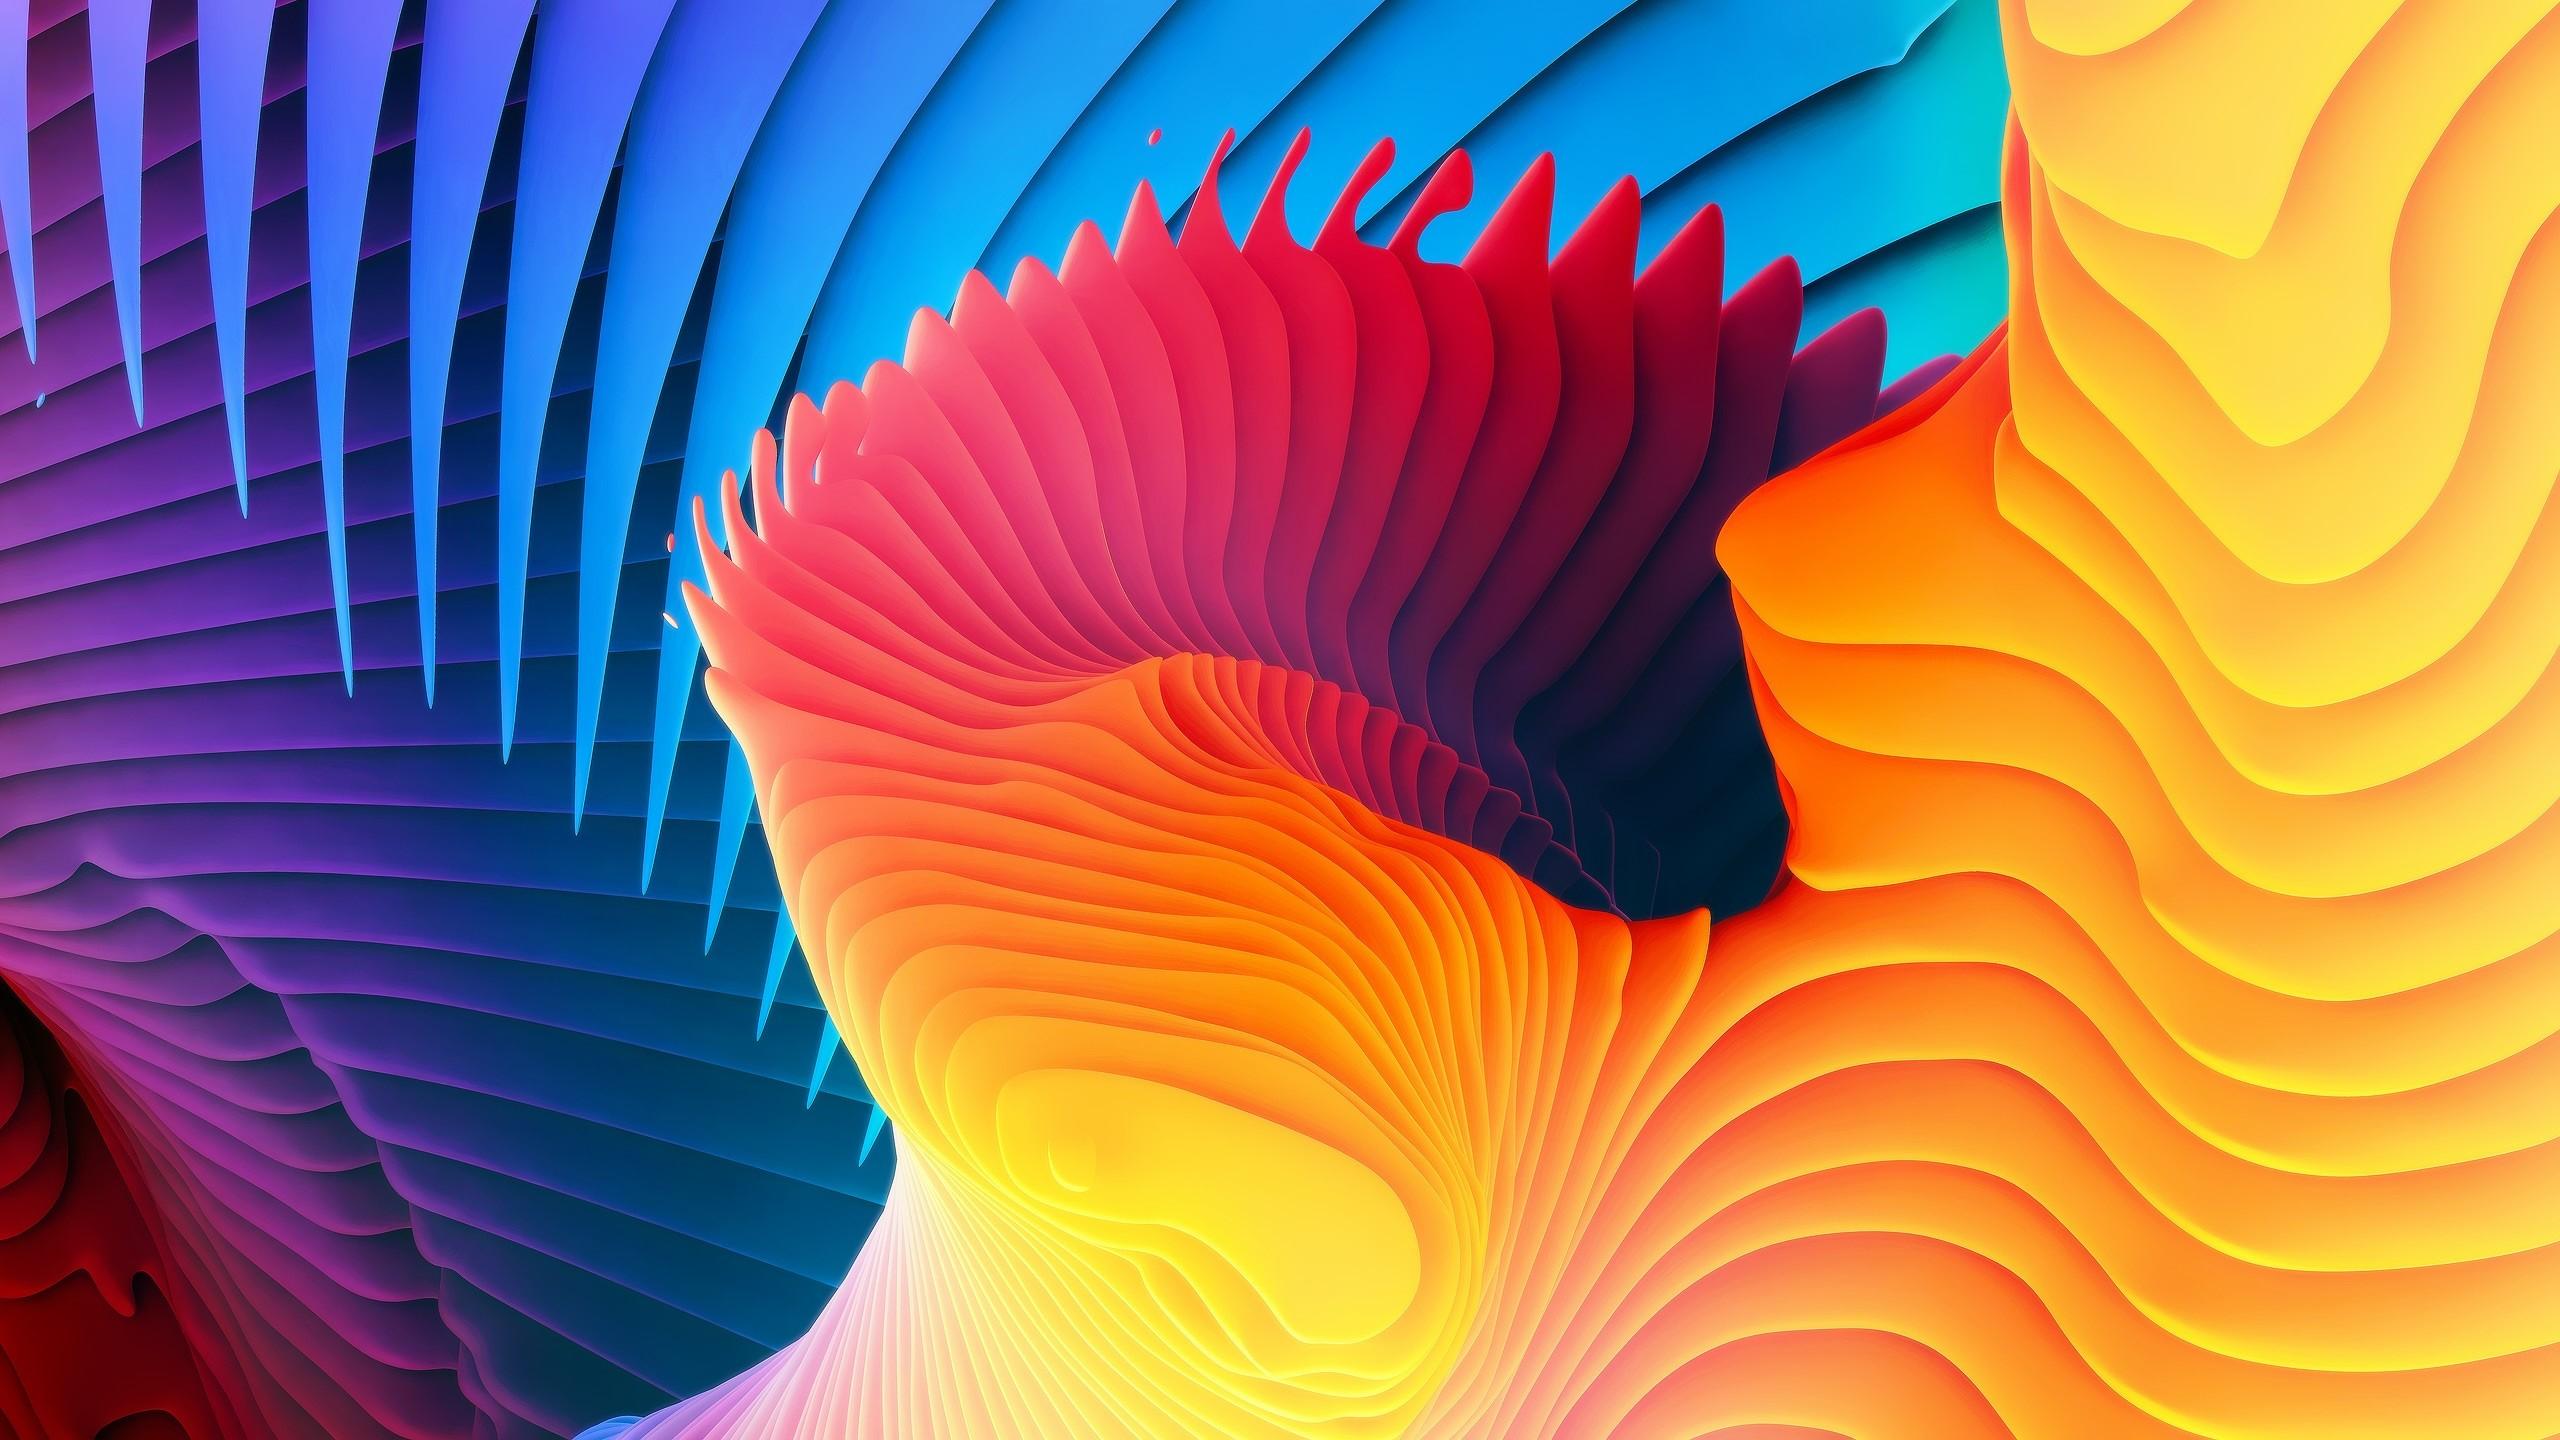 Samsung Galaxy Tab HD Wallpapers